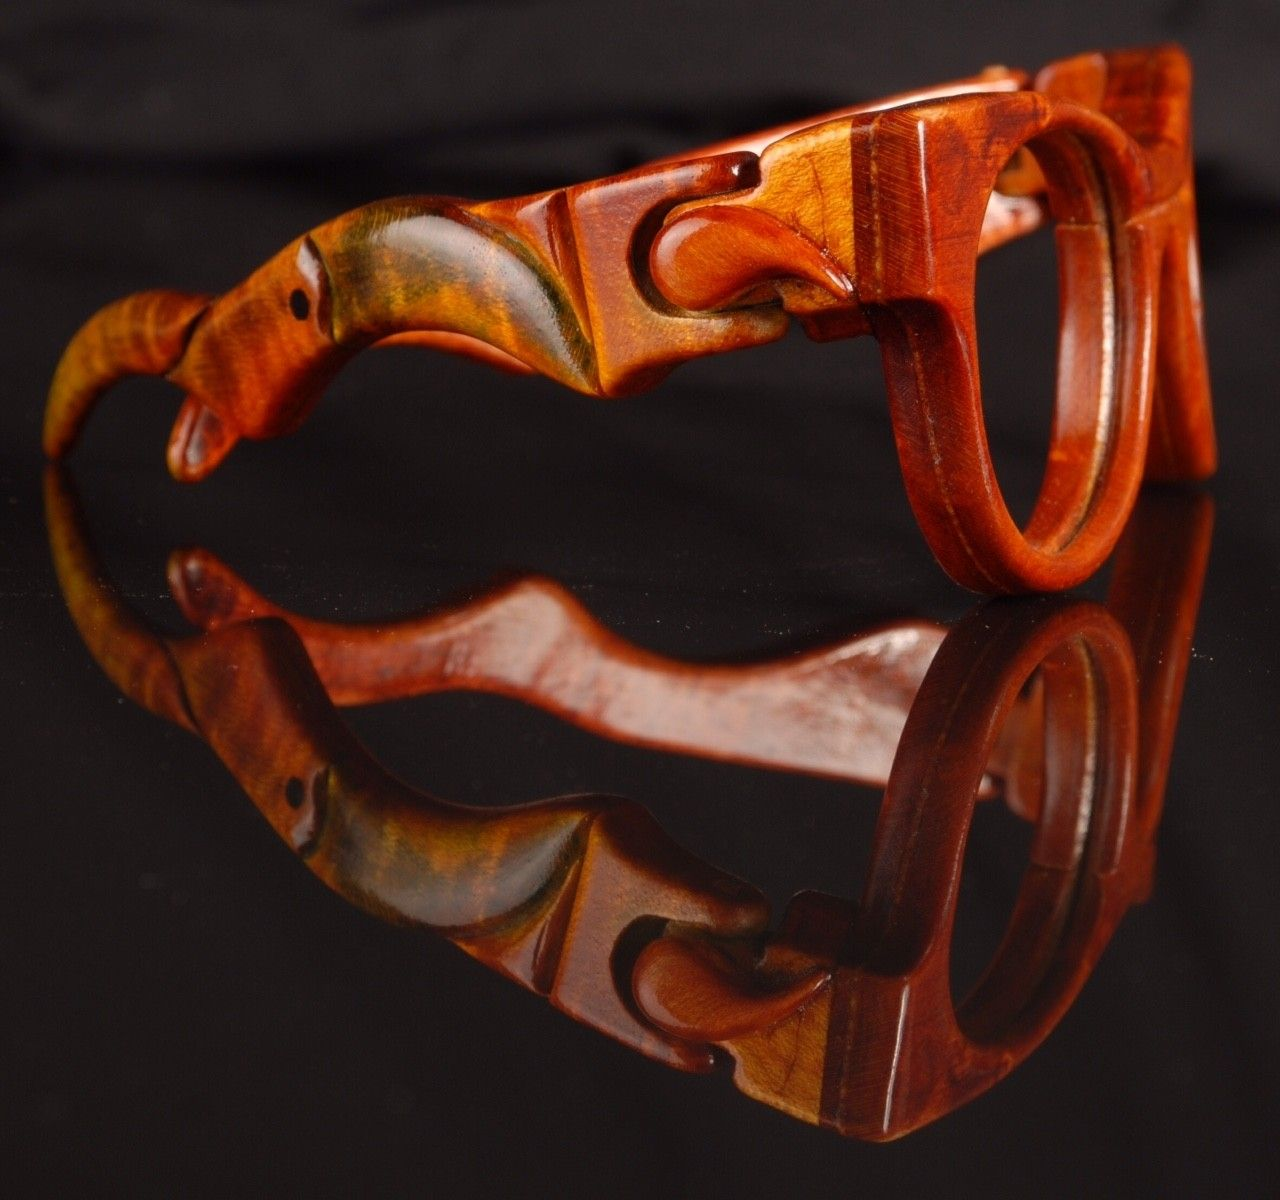 Spectacular Handmade Wooden Sunglasses - 2016-05 Jaromir Toucan 01.jpg